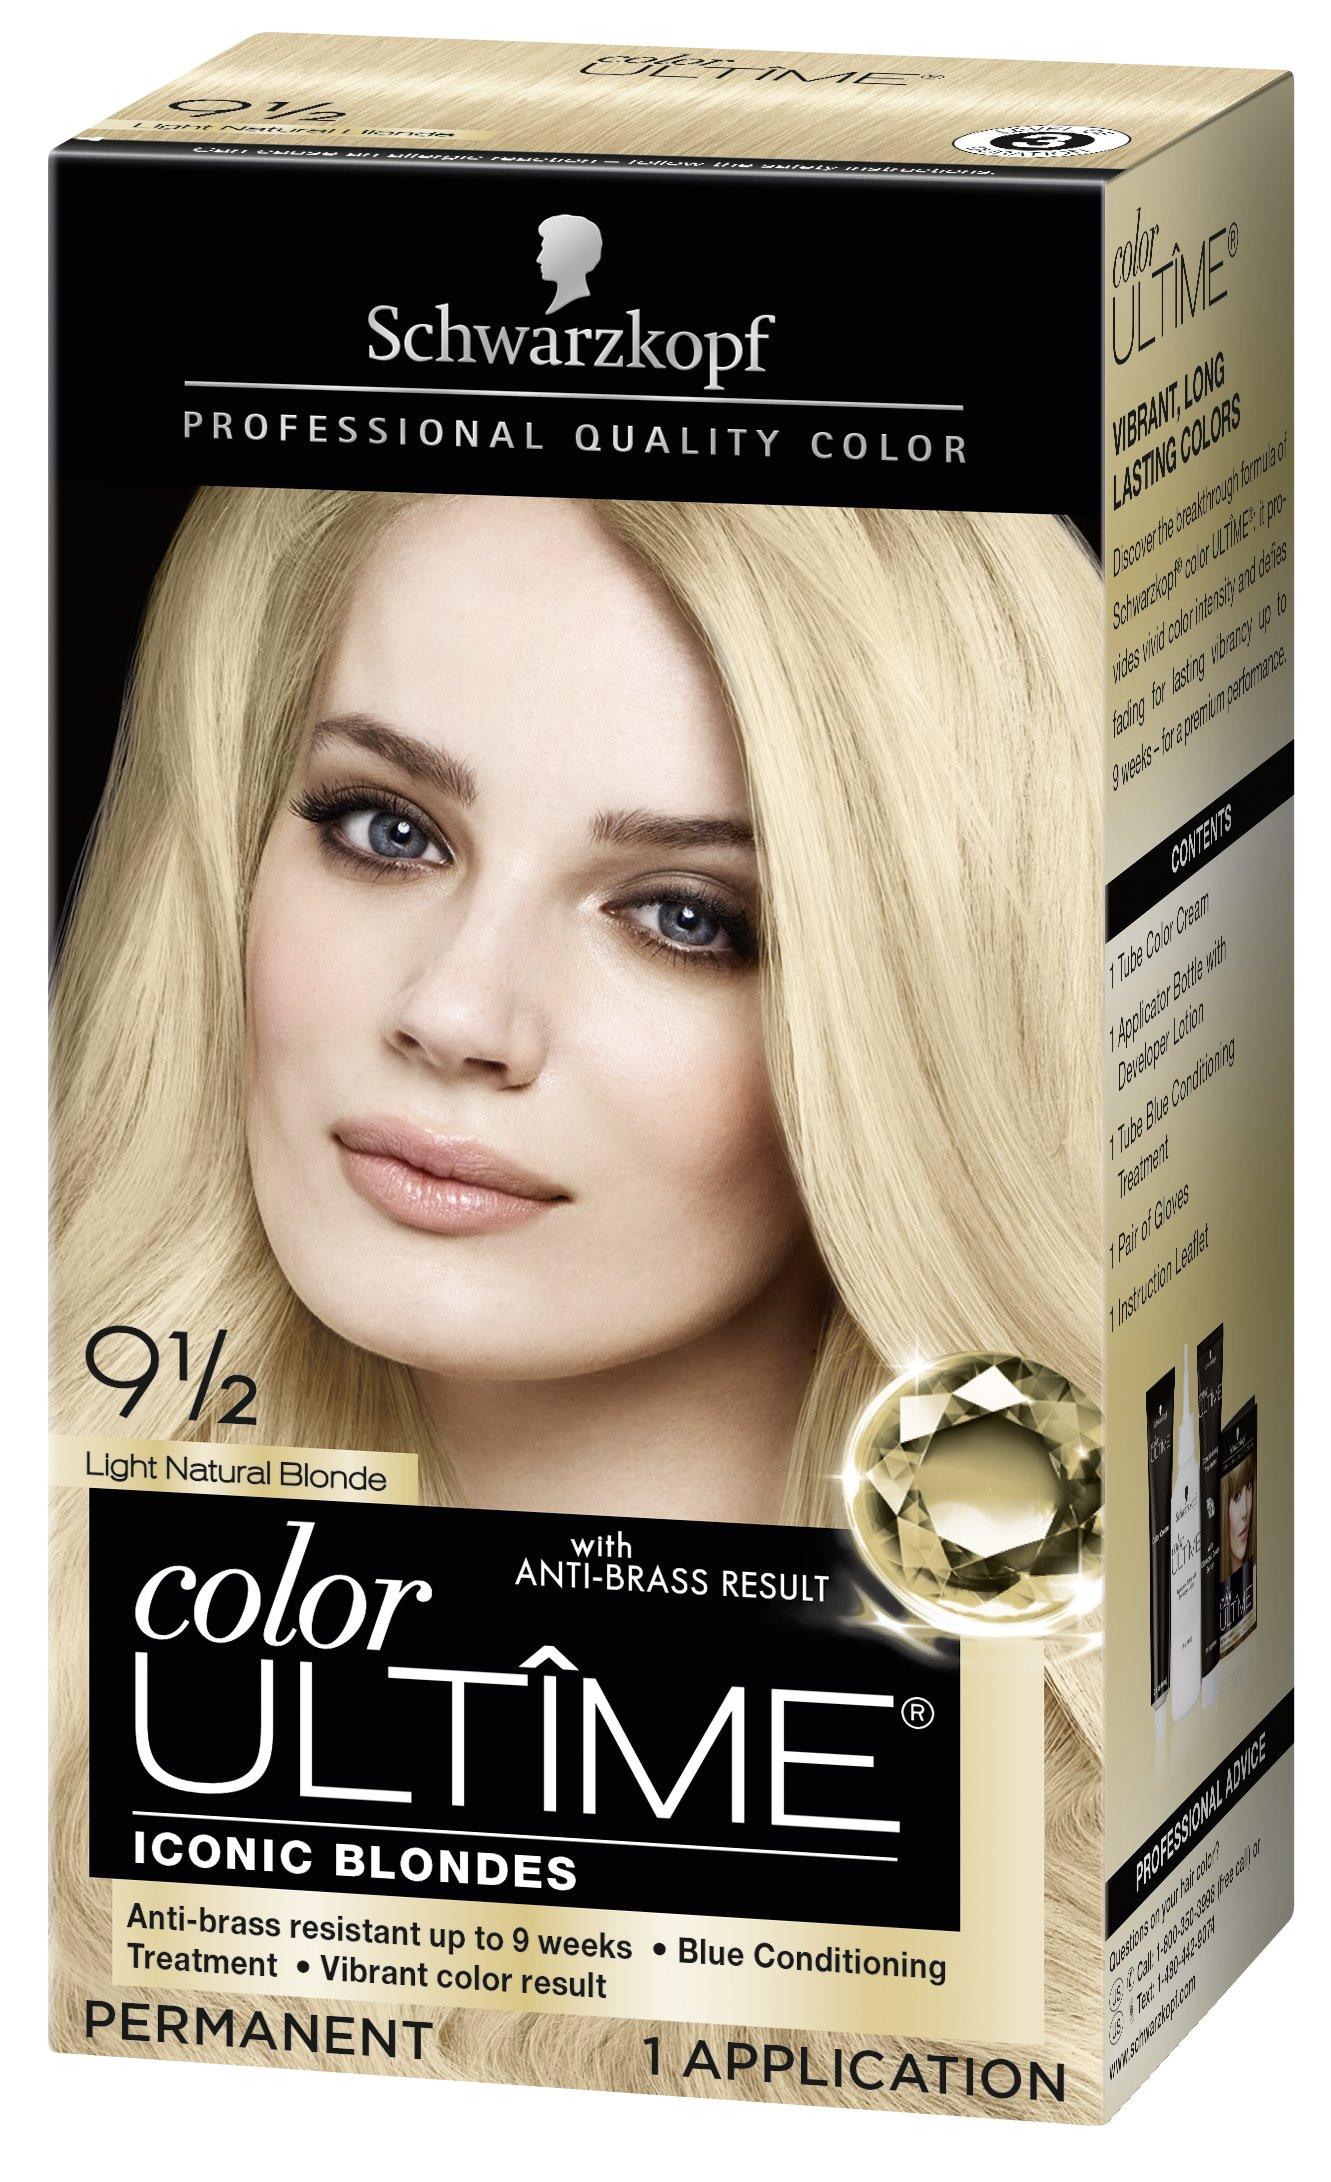 amazon com schwarzkopf ultime hair color cream light natural blonde 9 5 2 03 ounces beauty